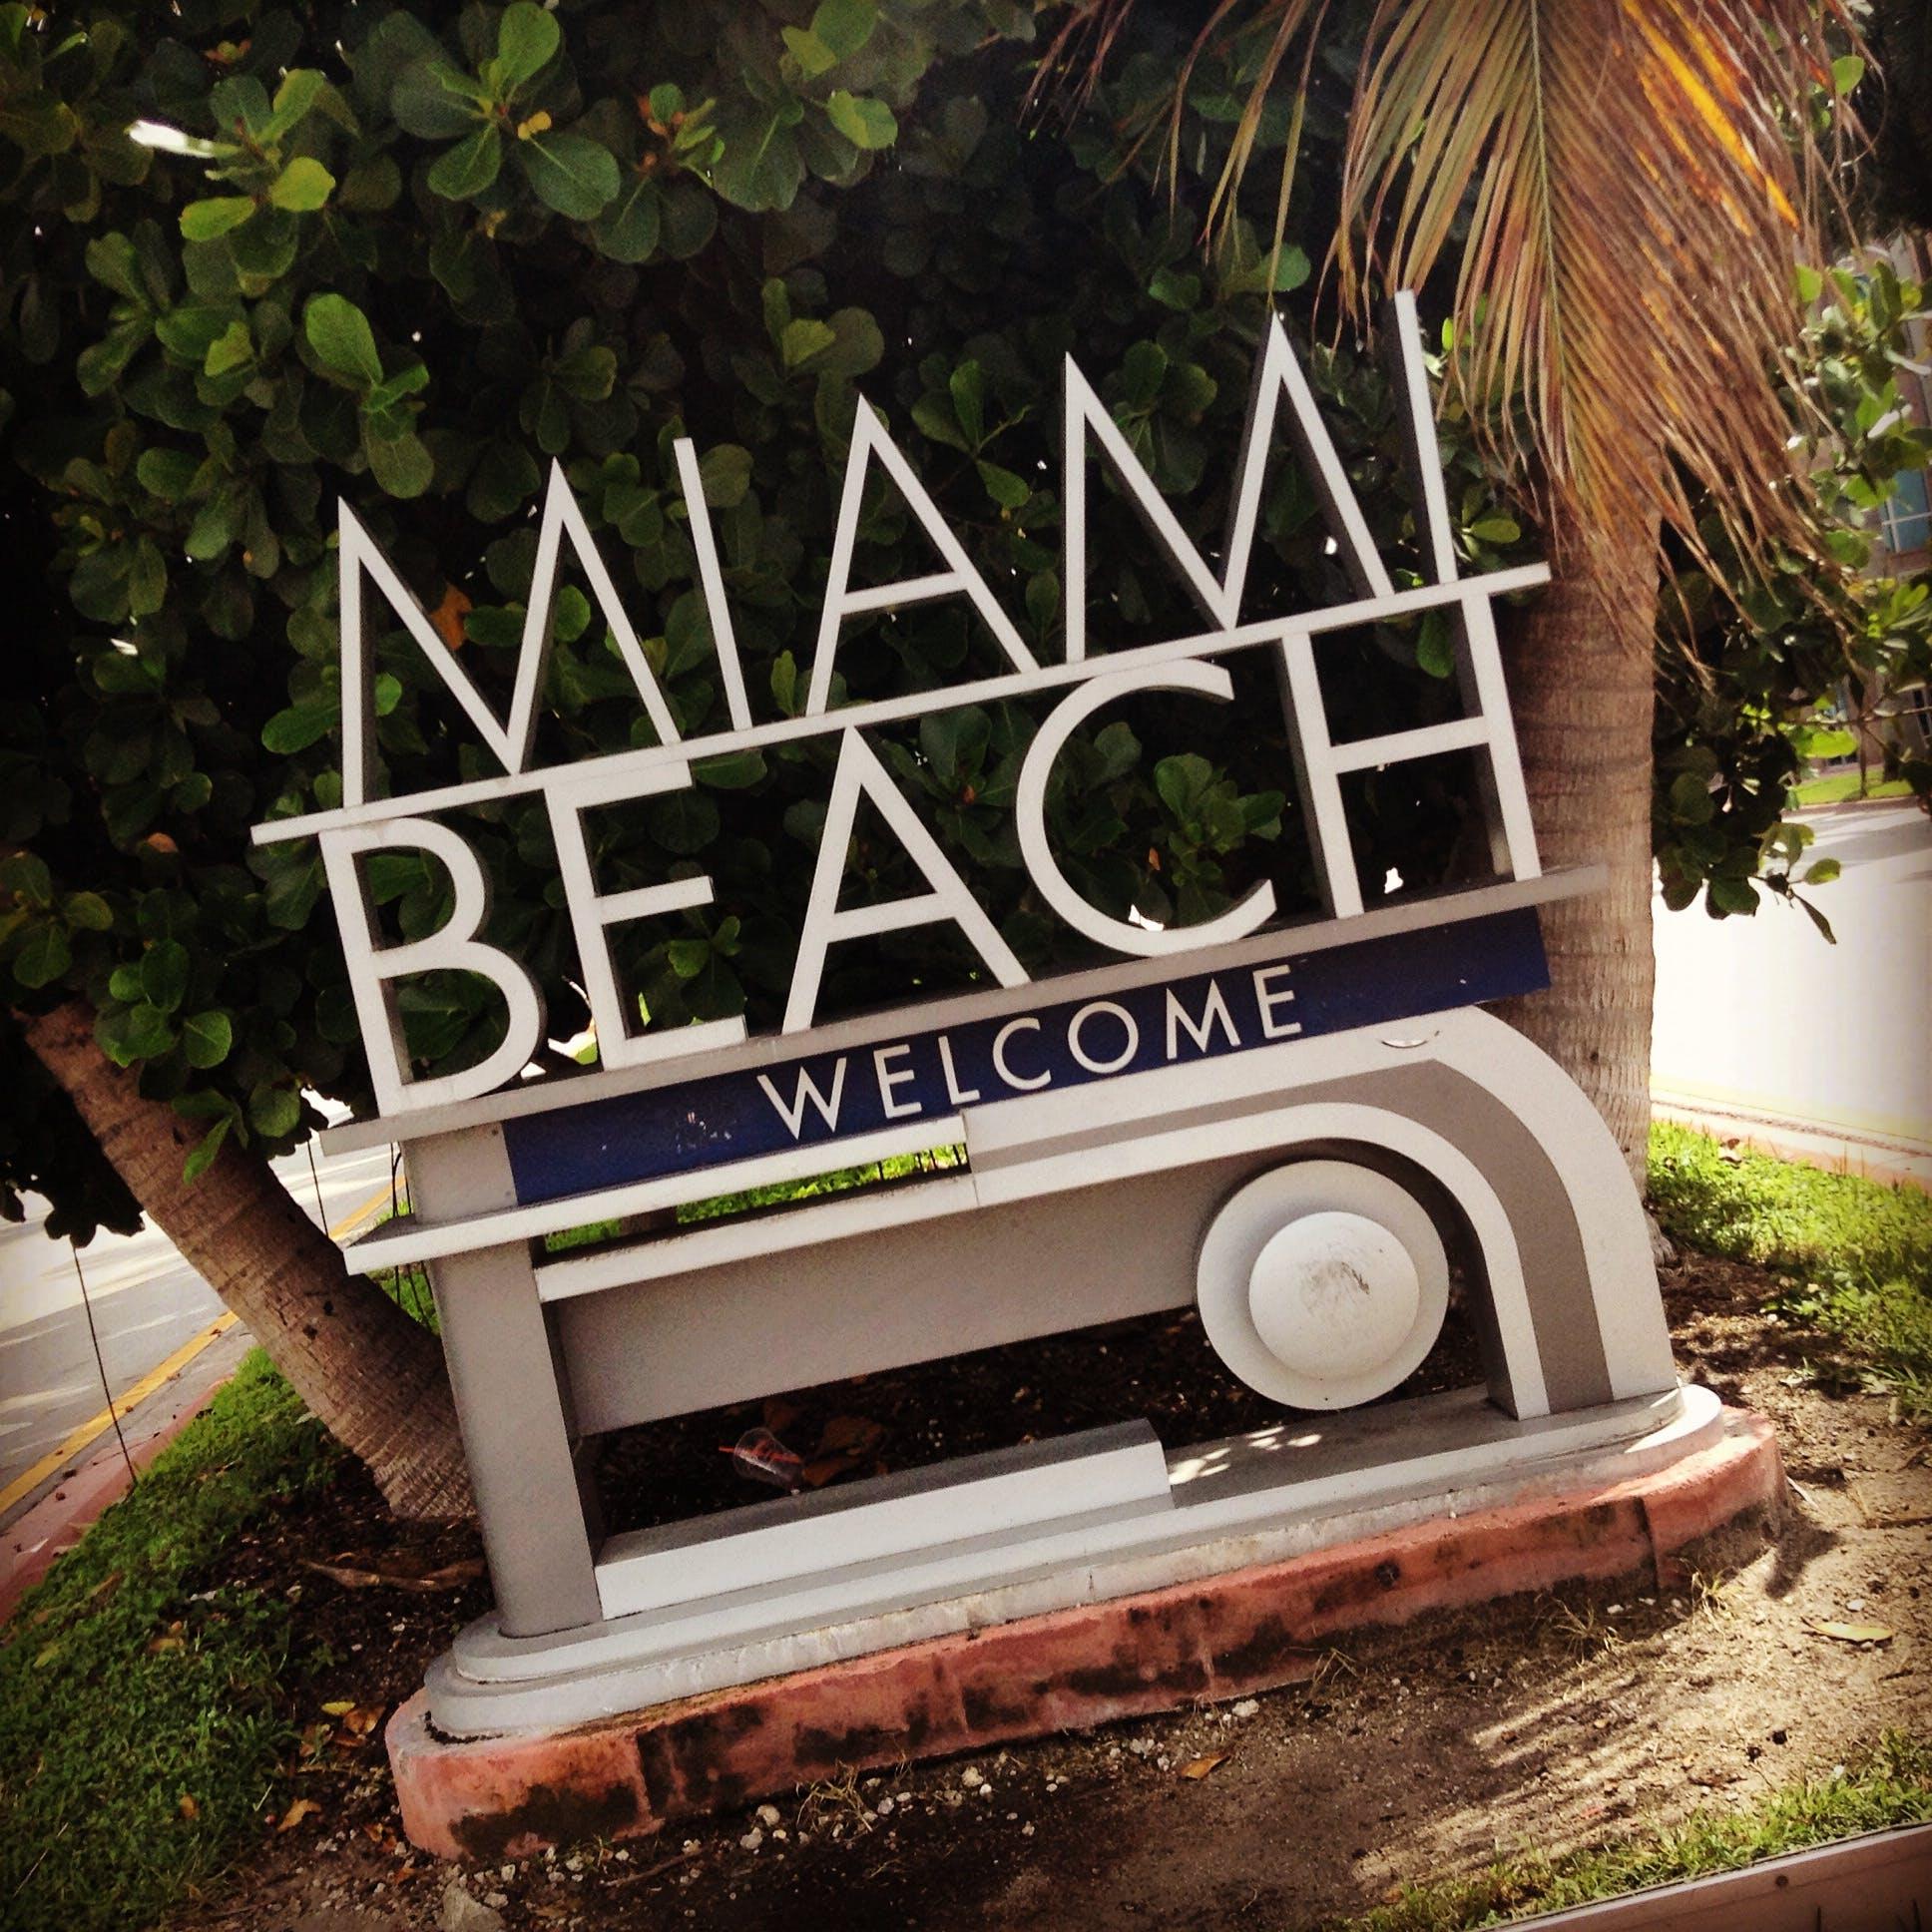 Free stock photo of beach, Miami Beach, traveling, united states of america